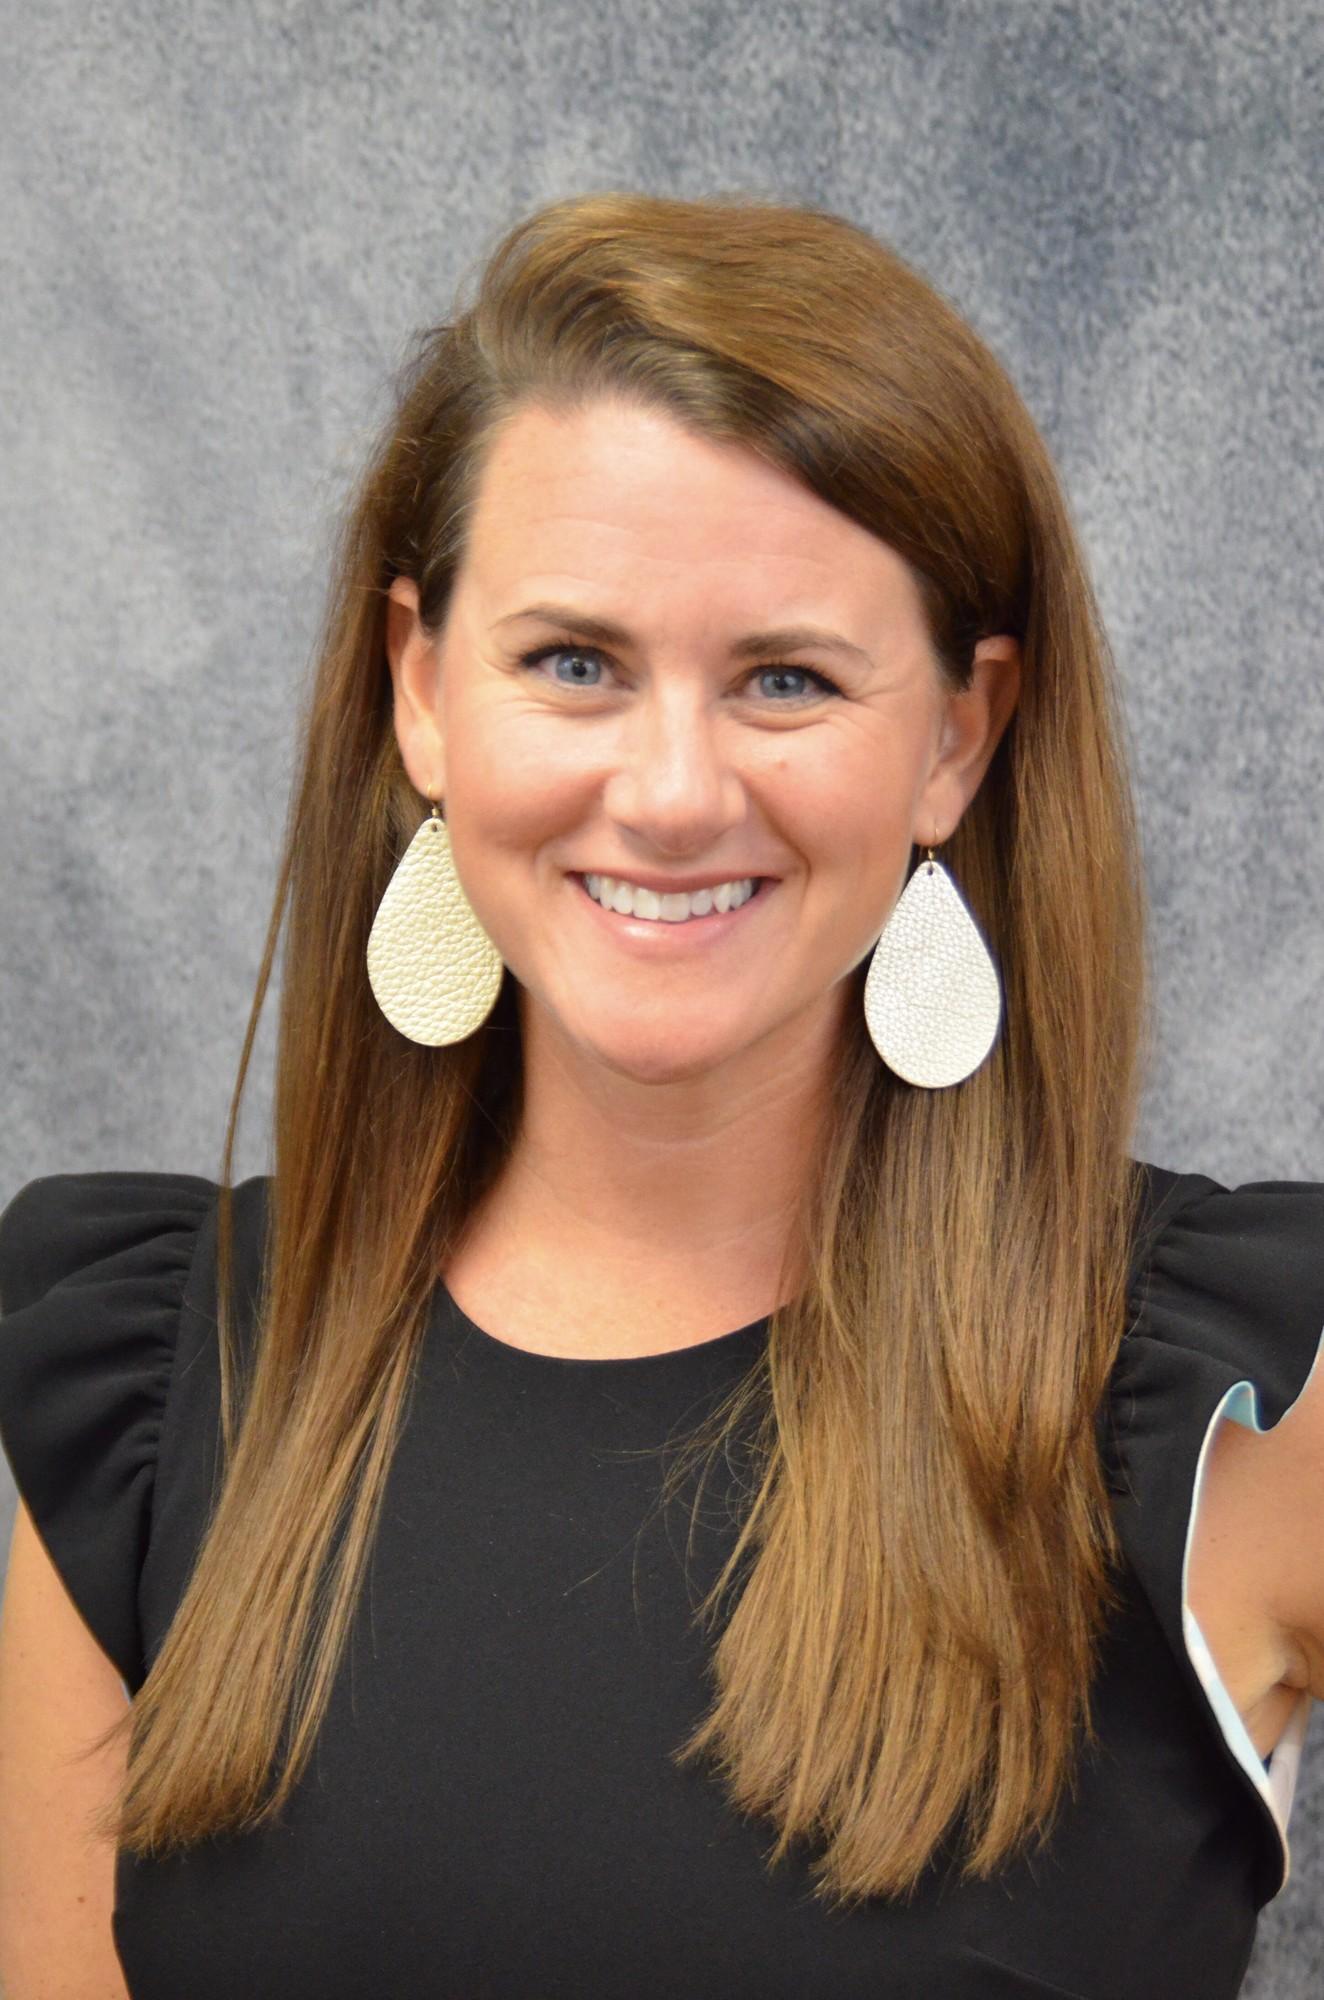 Misty Burton, Junior League of Columbia President